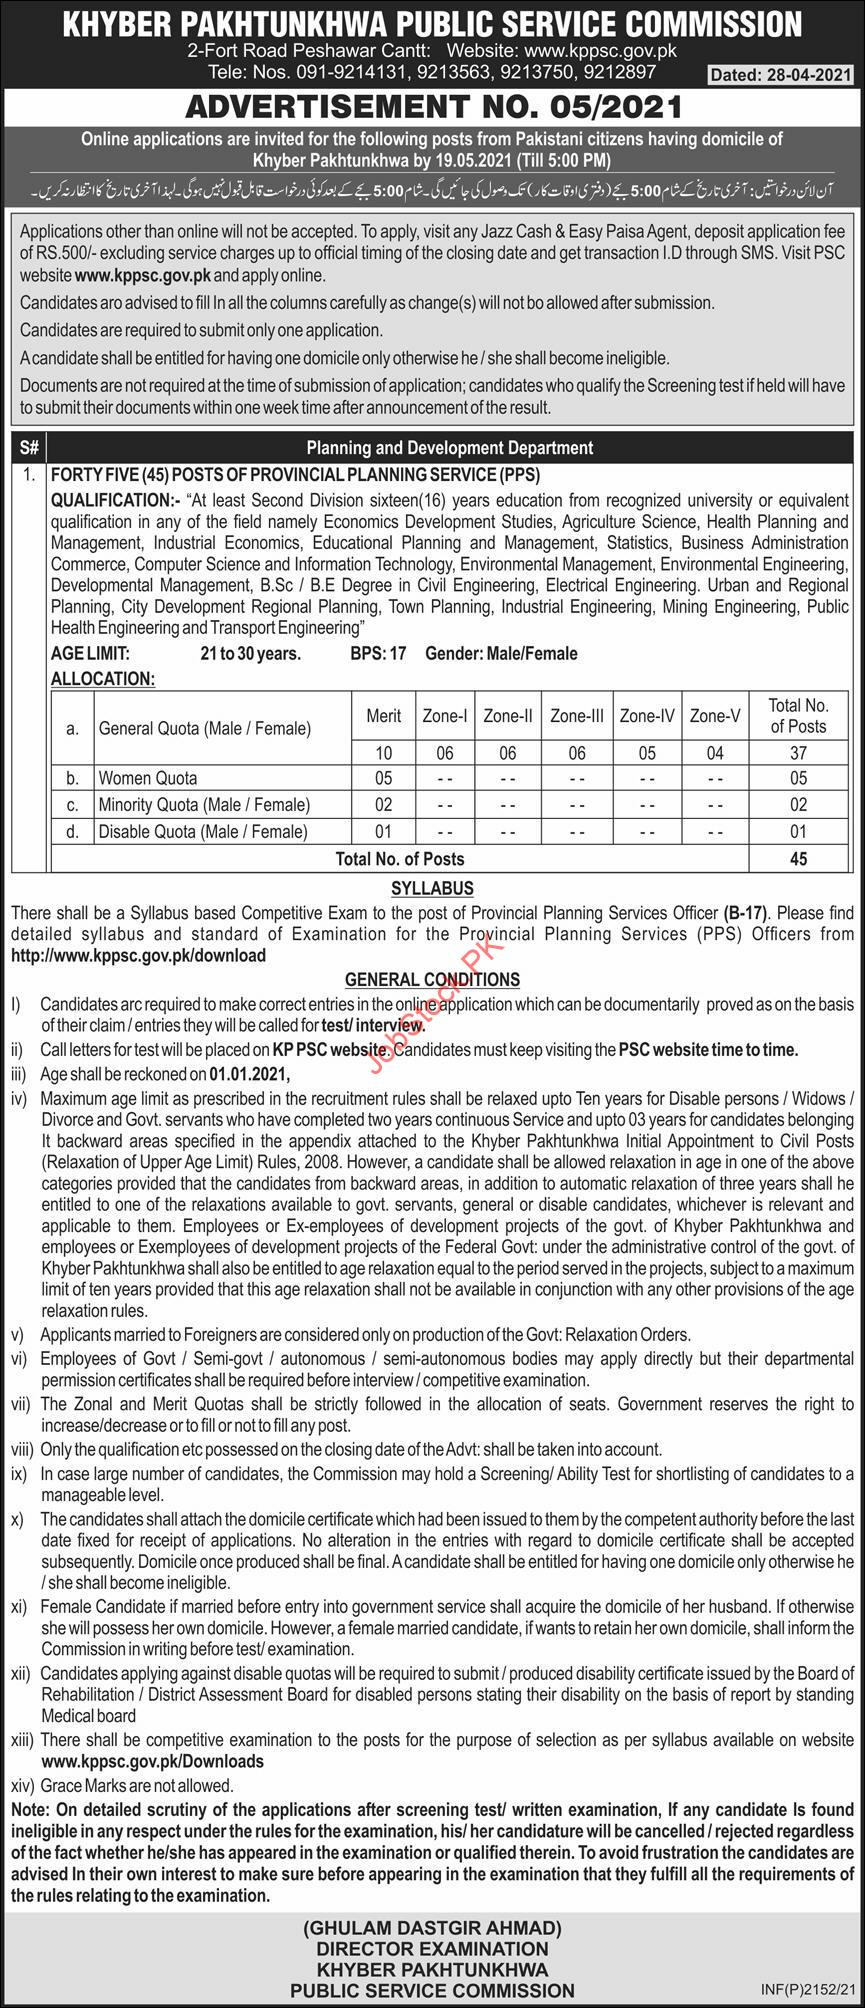 Kppsc Jobs 2021 Advertisement No.05.2021 Latest Apply Online